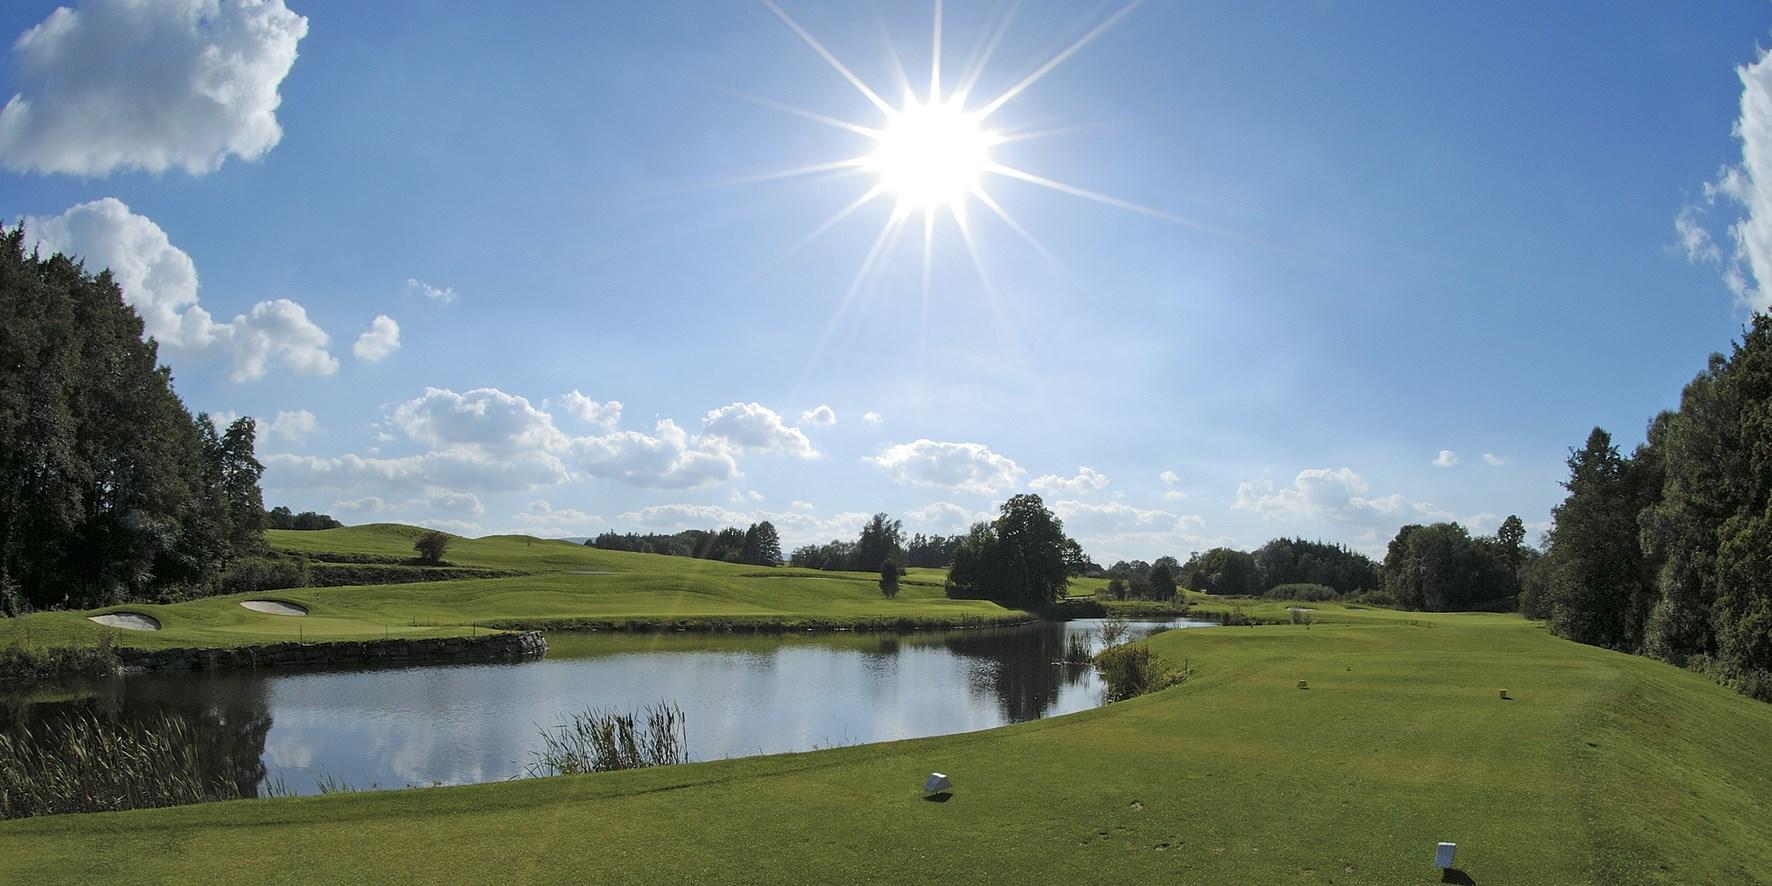 Golf_Ropice_02.jpg